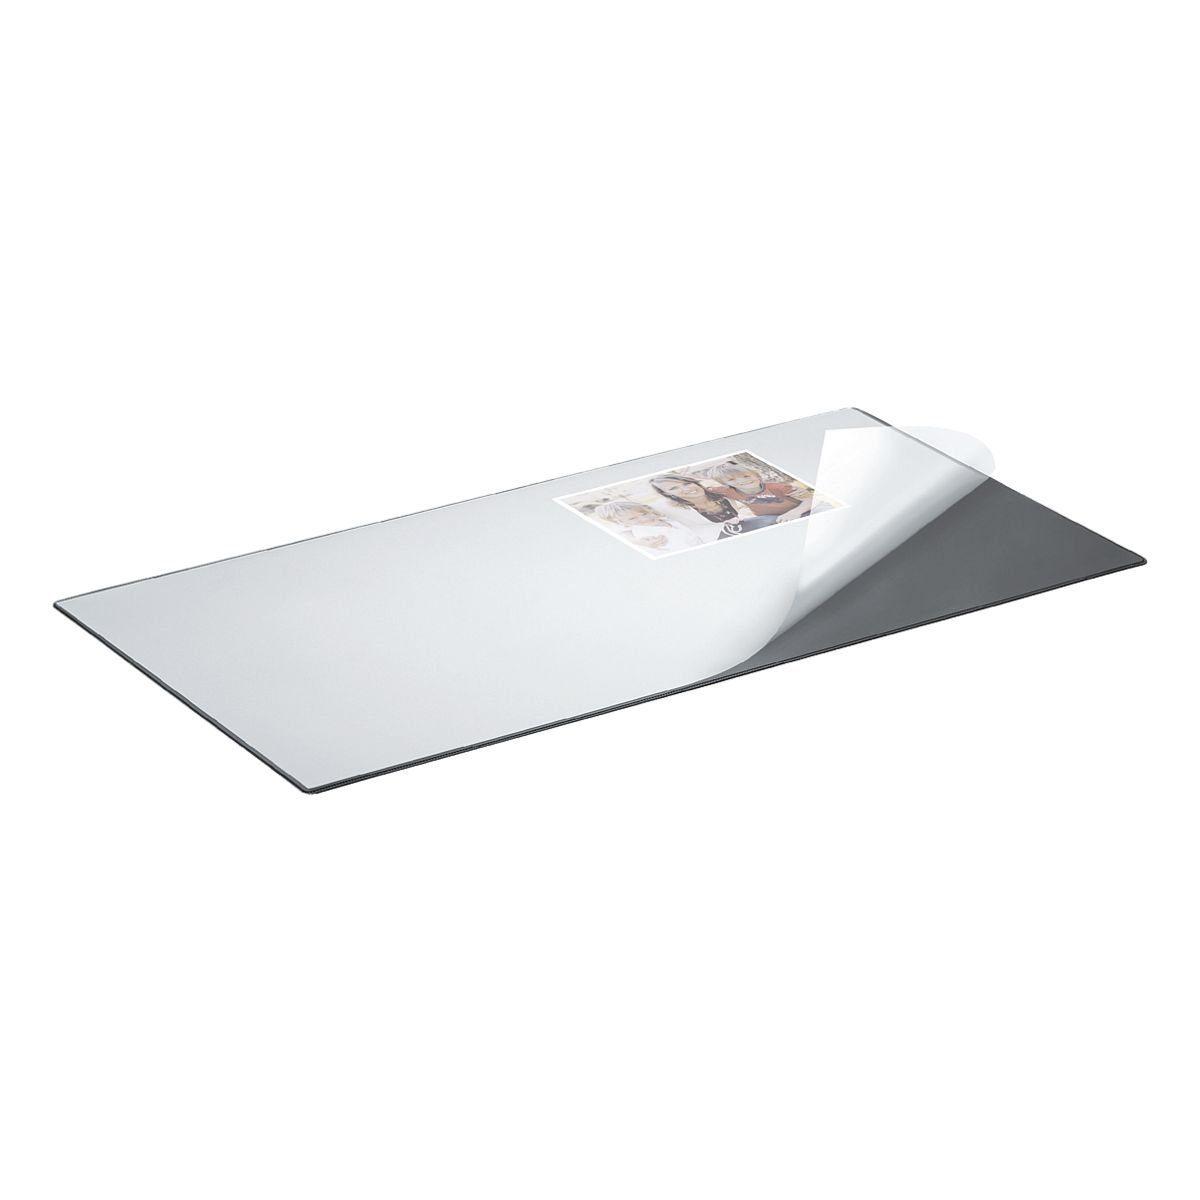 Hansa Schreibunterlage »Computer Pad Cover«